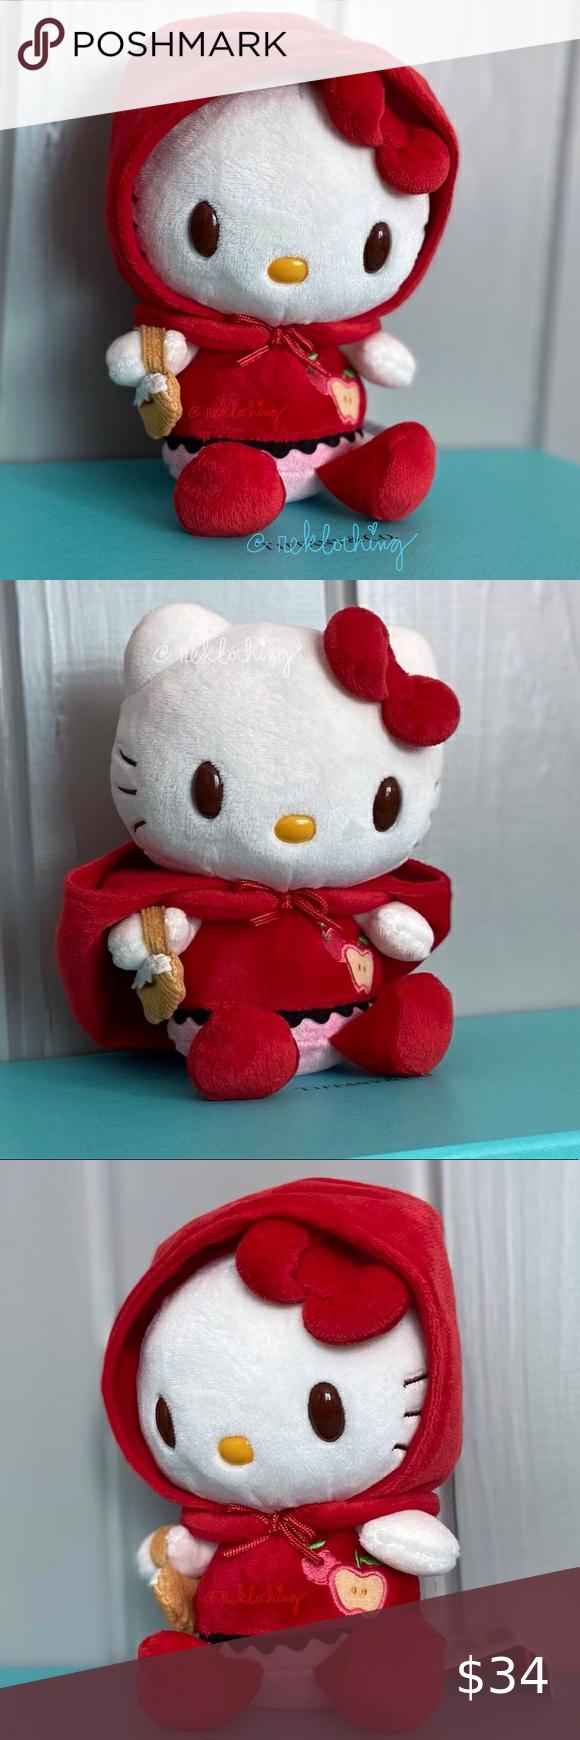 Sanrio Hello Kitty Little Red Riding Hood Plush Hello Kitty Plush Collectable Plush Sanrio Hello Kitty [ 1740 x 580 Pixel ]